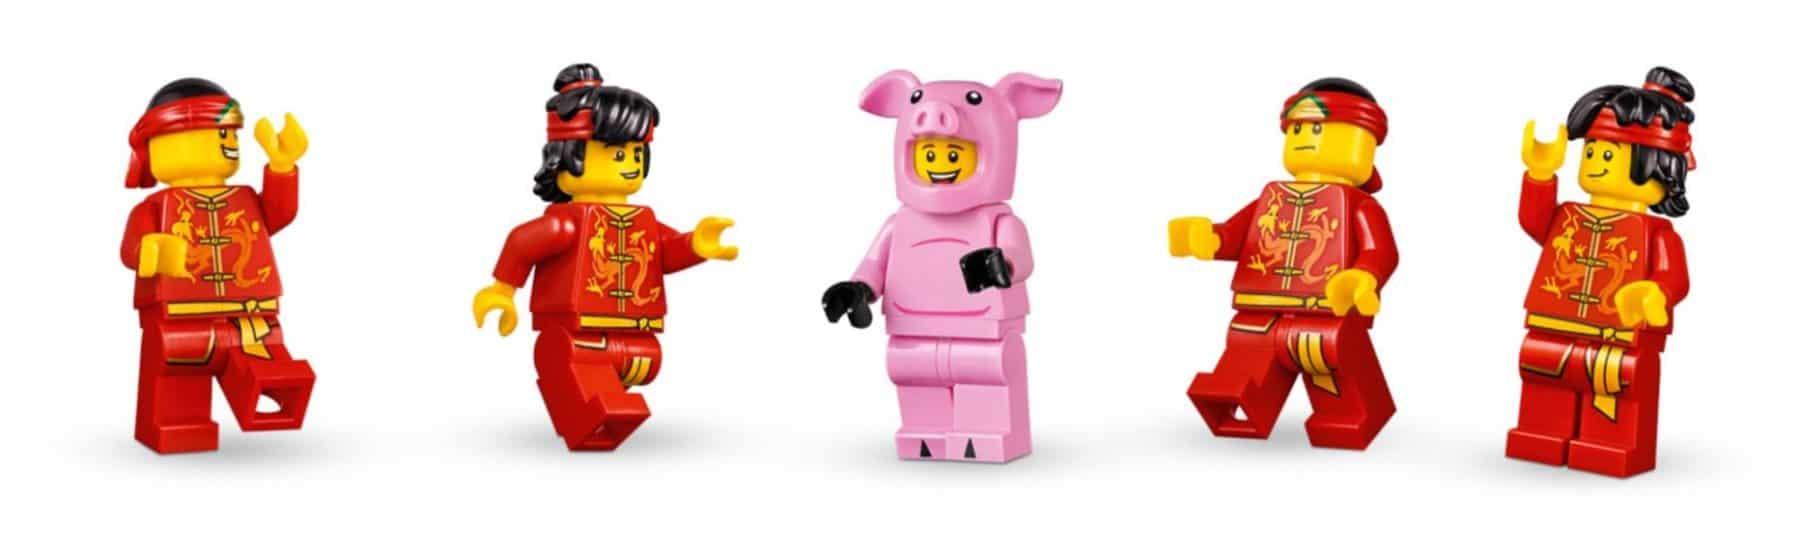 LEGO 80102 Dragon Dance Minifiguren